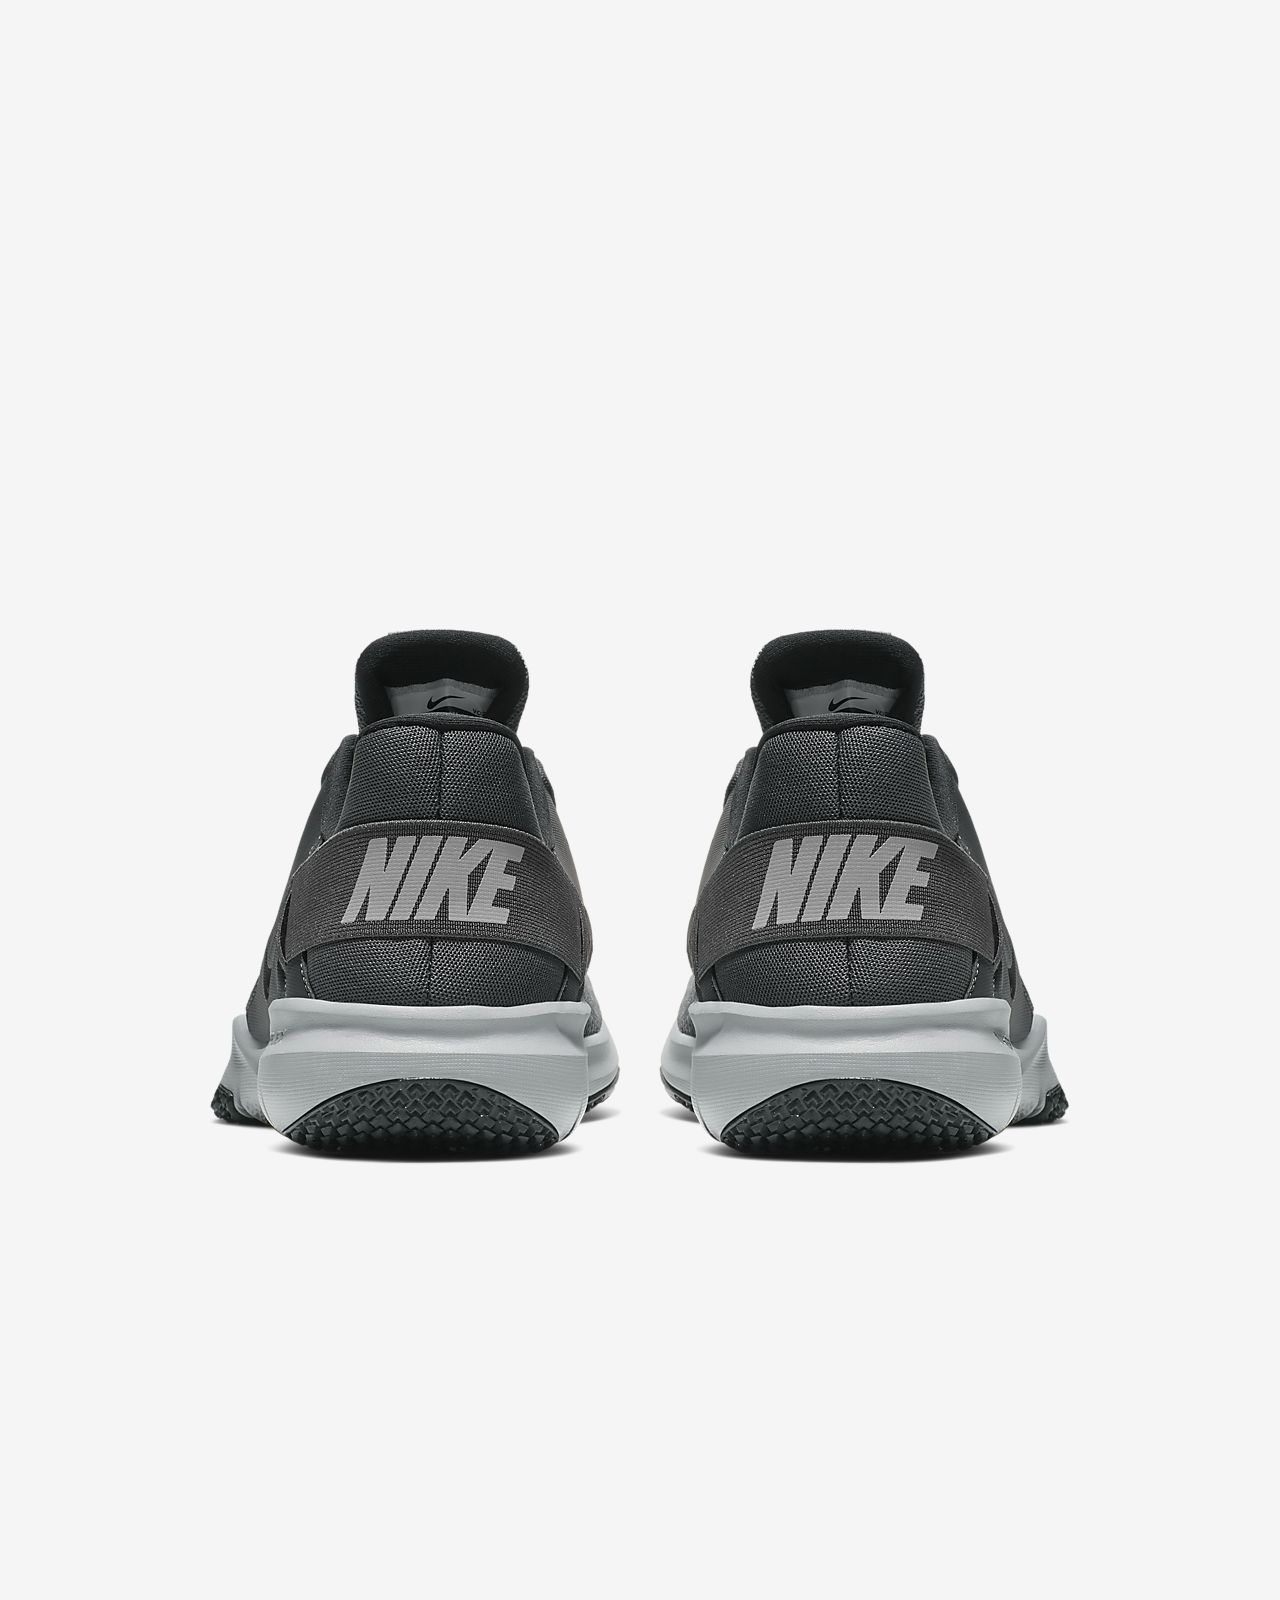 52c45fbd5cd7 Nike Flex Control 3 Men s Training Shoe. Nike.com